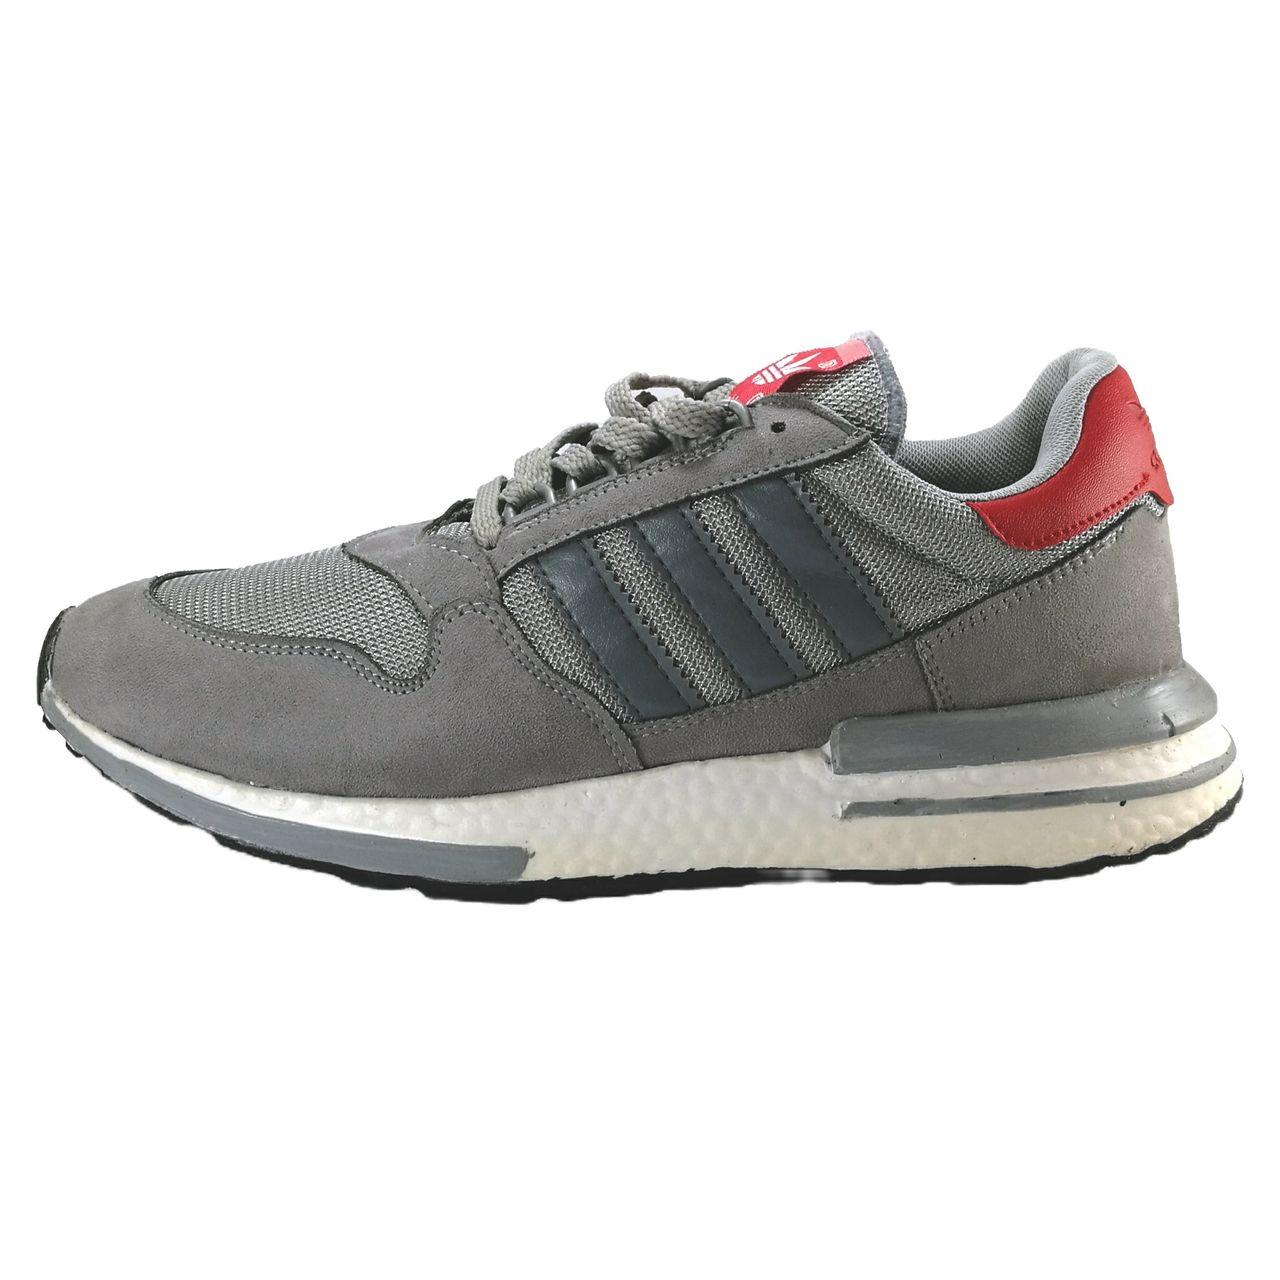 کفش راحتی مردانه مدل ZX500 کد 4031                     غیر اصل